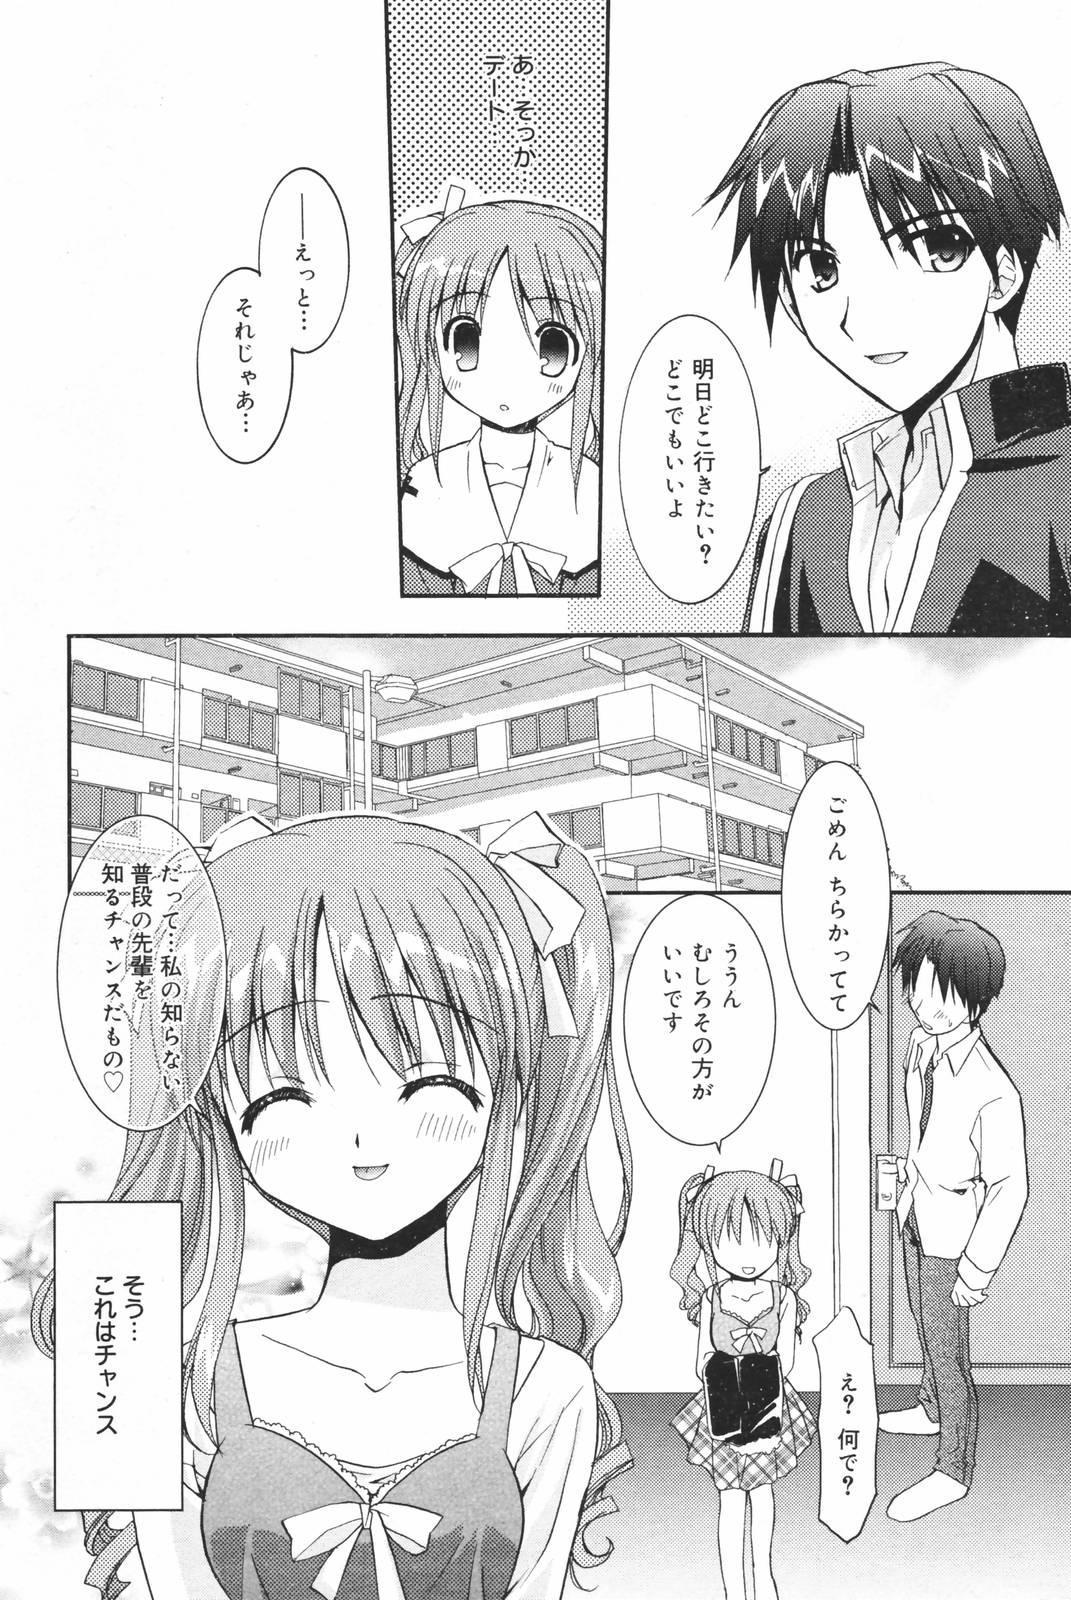 Manga Bangaichi 2007-03 39